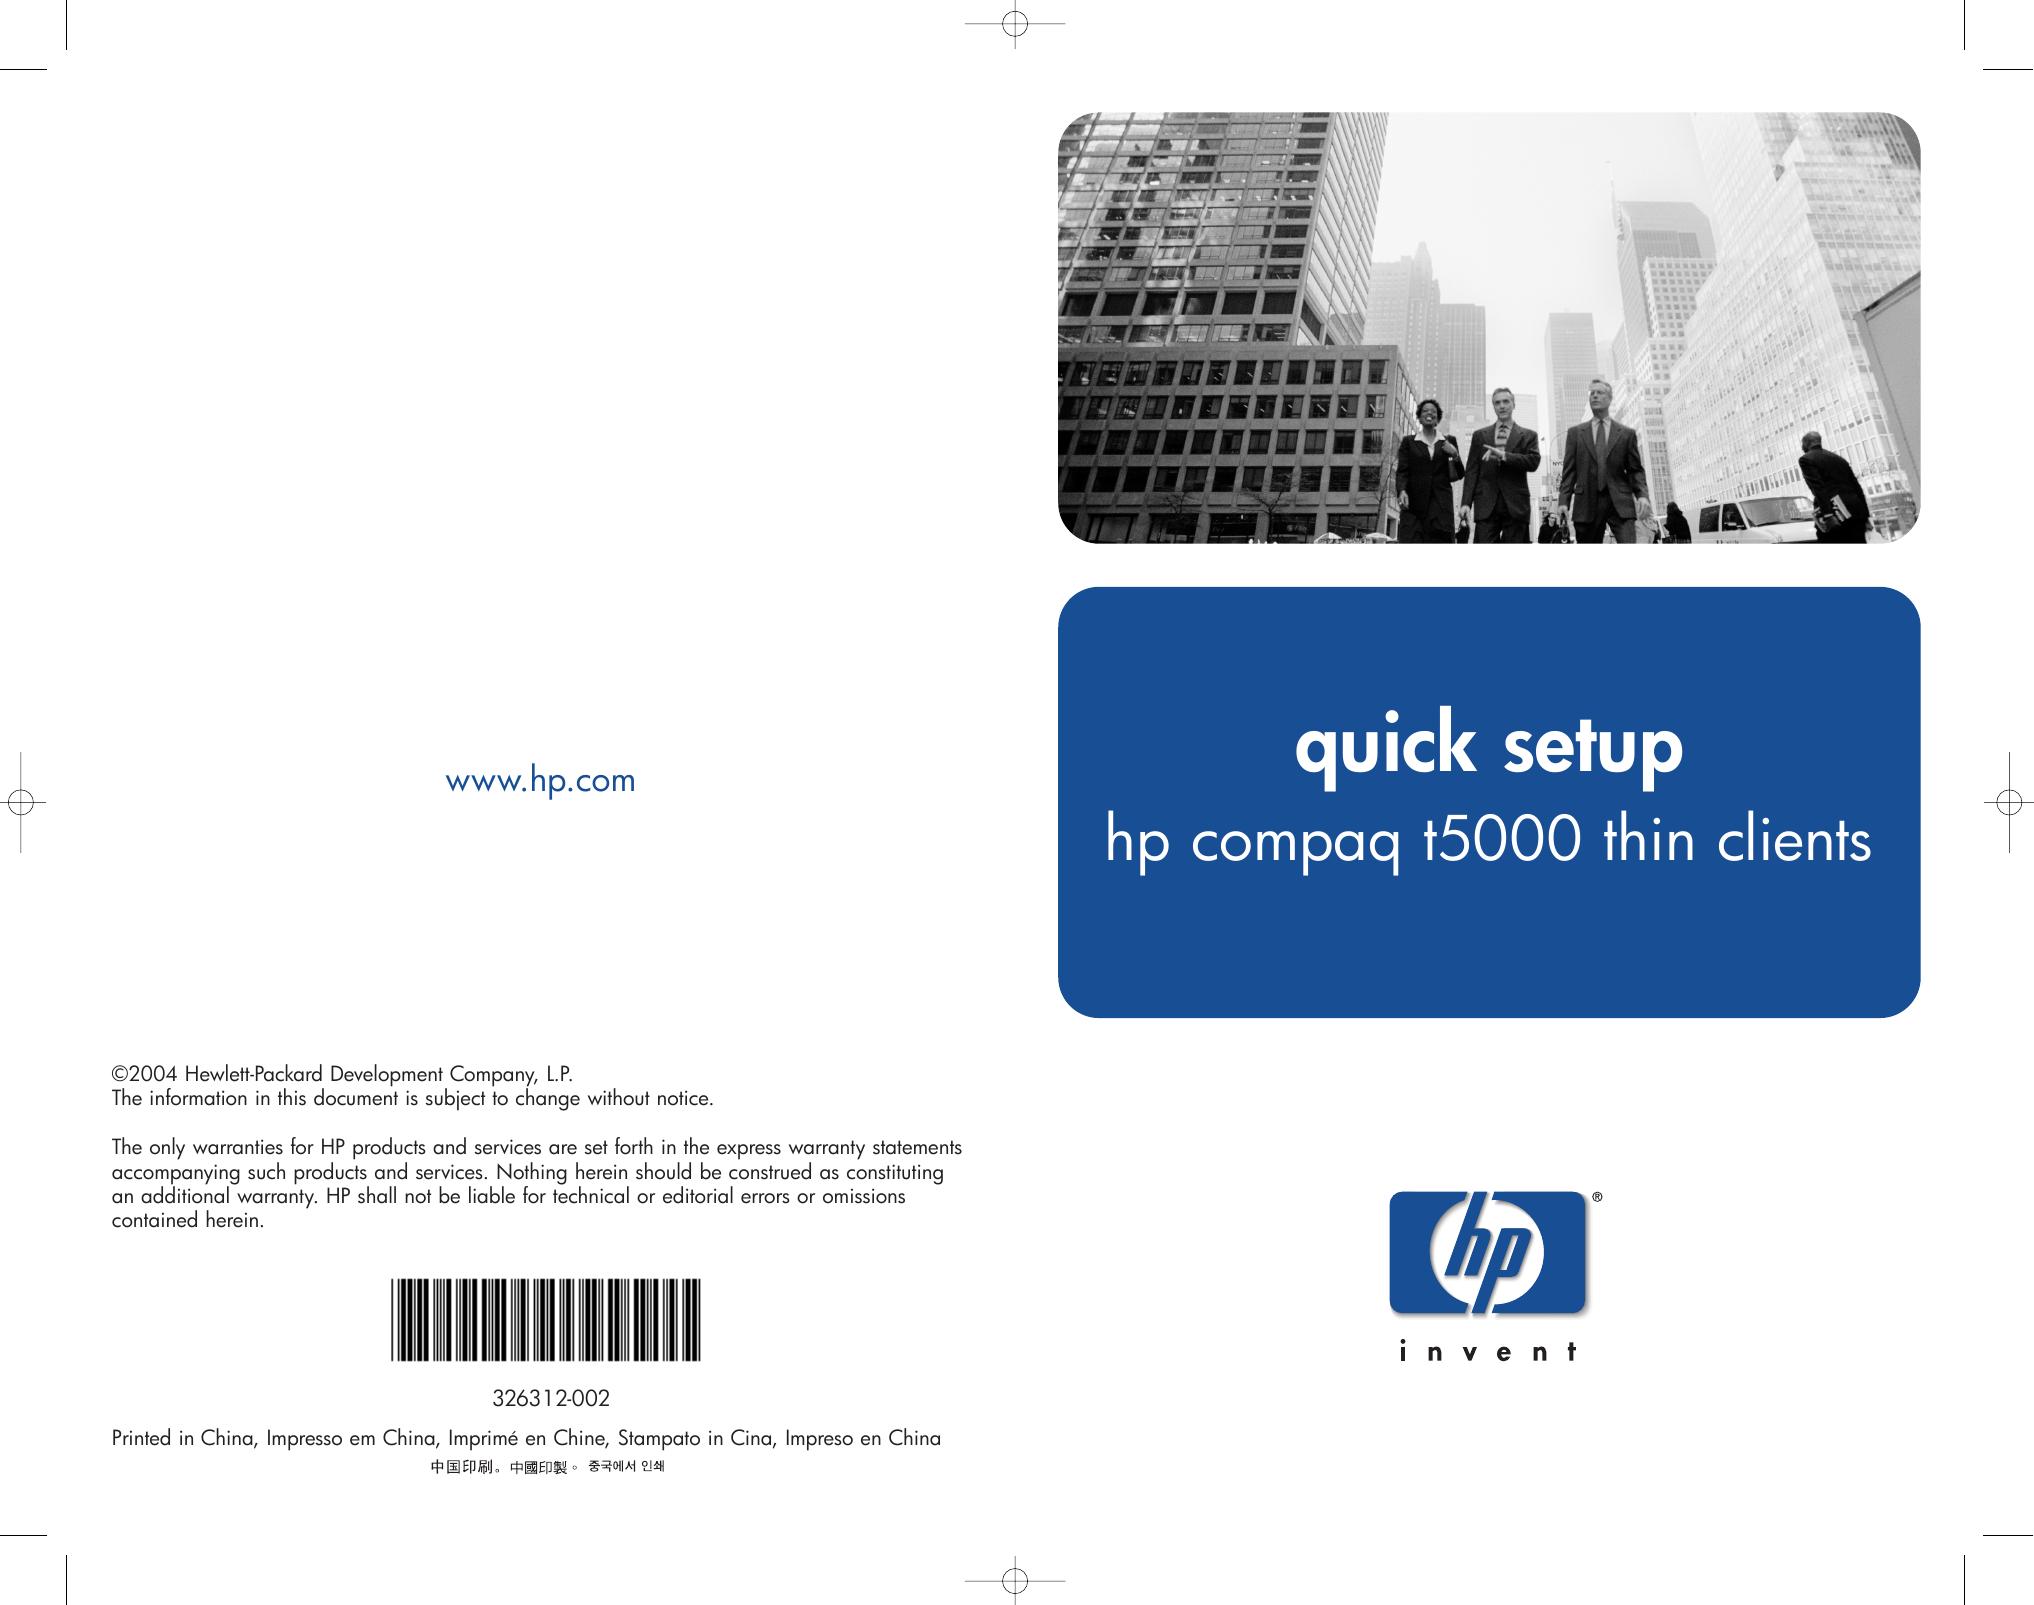 hp compaq thin clients t5000 users manual 326312 002 rh usermanual wiki HP T5000 Drivers HP Thin Client T5000 Manual